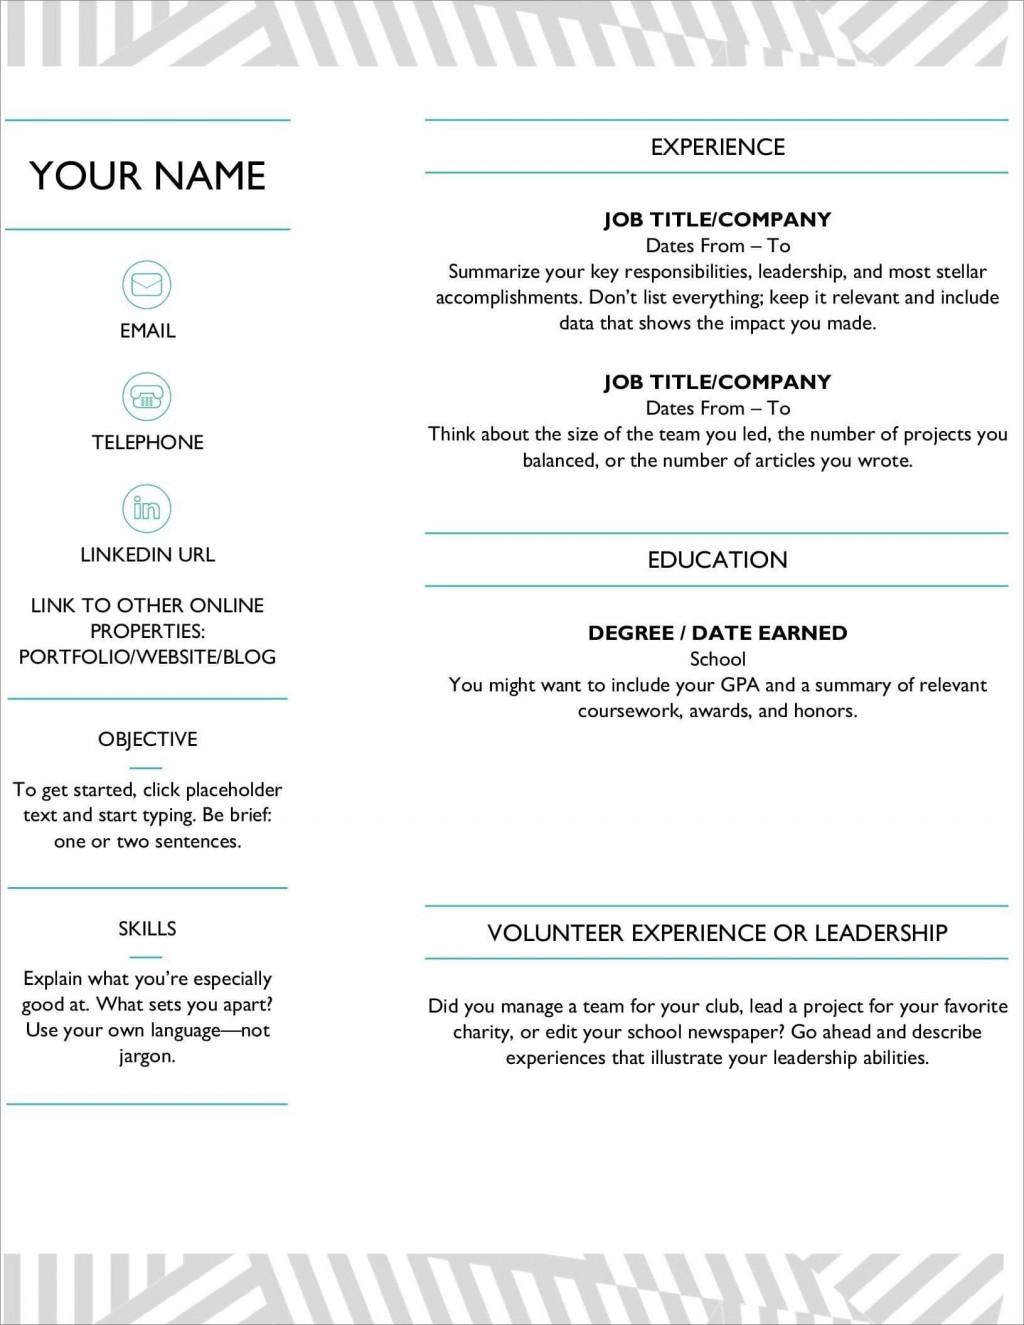 009 Phenomenal Free Professional Resume Template Microsoft Word Example  Cv 2010Large